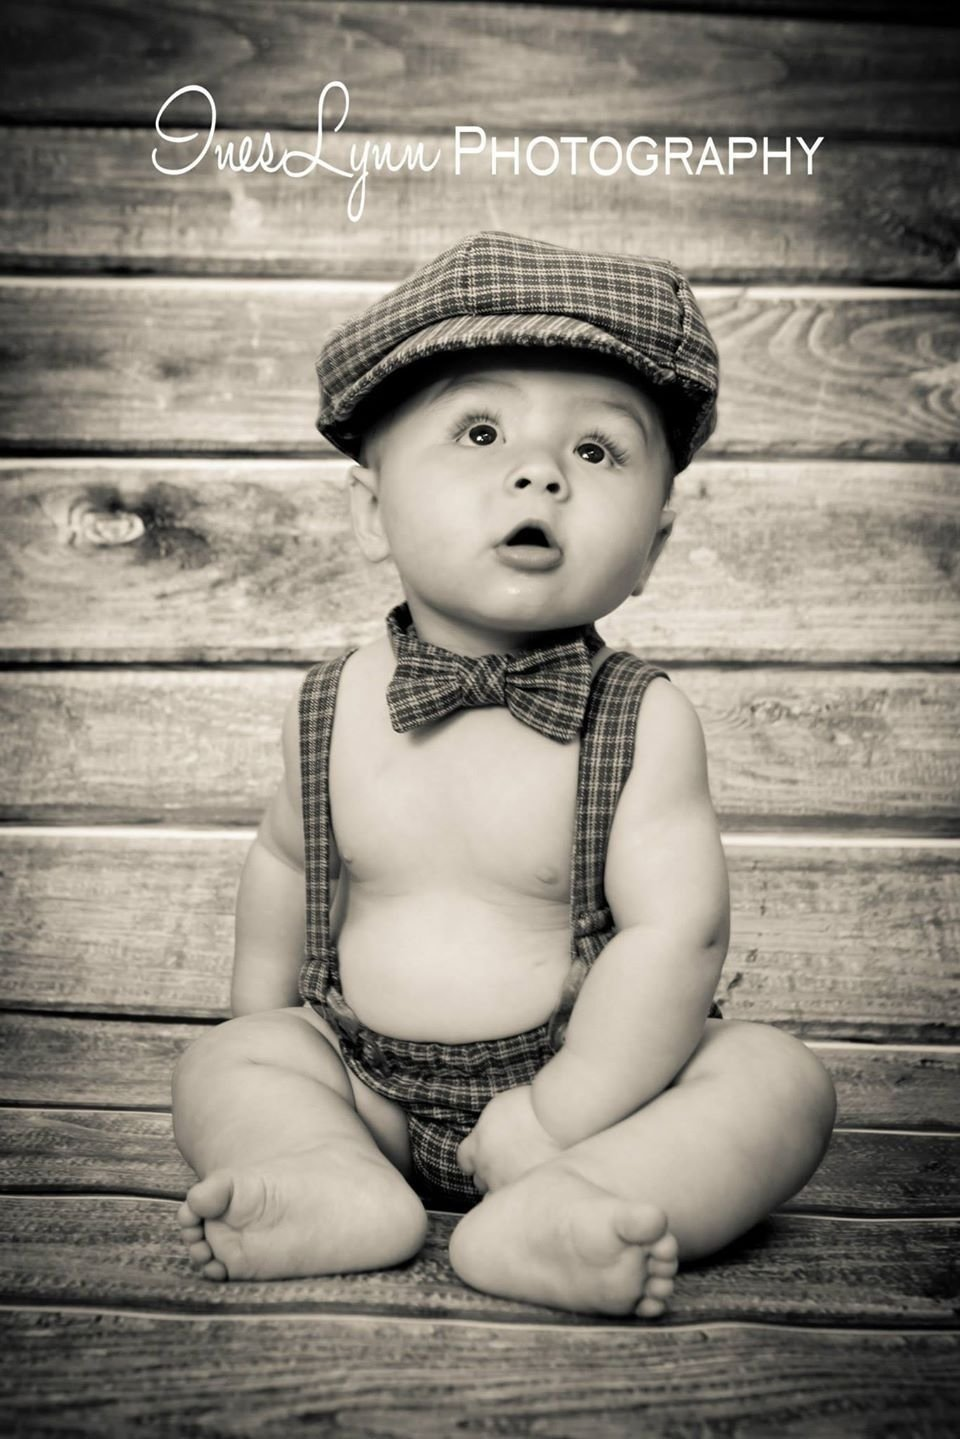 10 Stunning Baby Boy Photo Shoot Ideas 6 month old baby photography ideas baby boy photo ideas vintage 2 2021